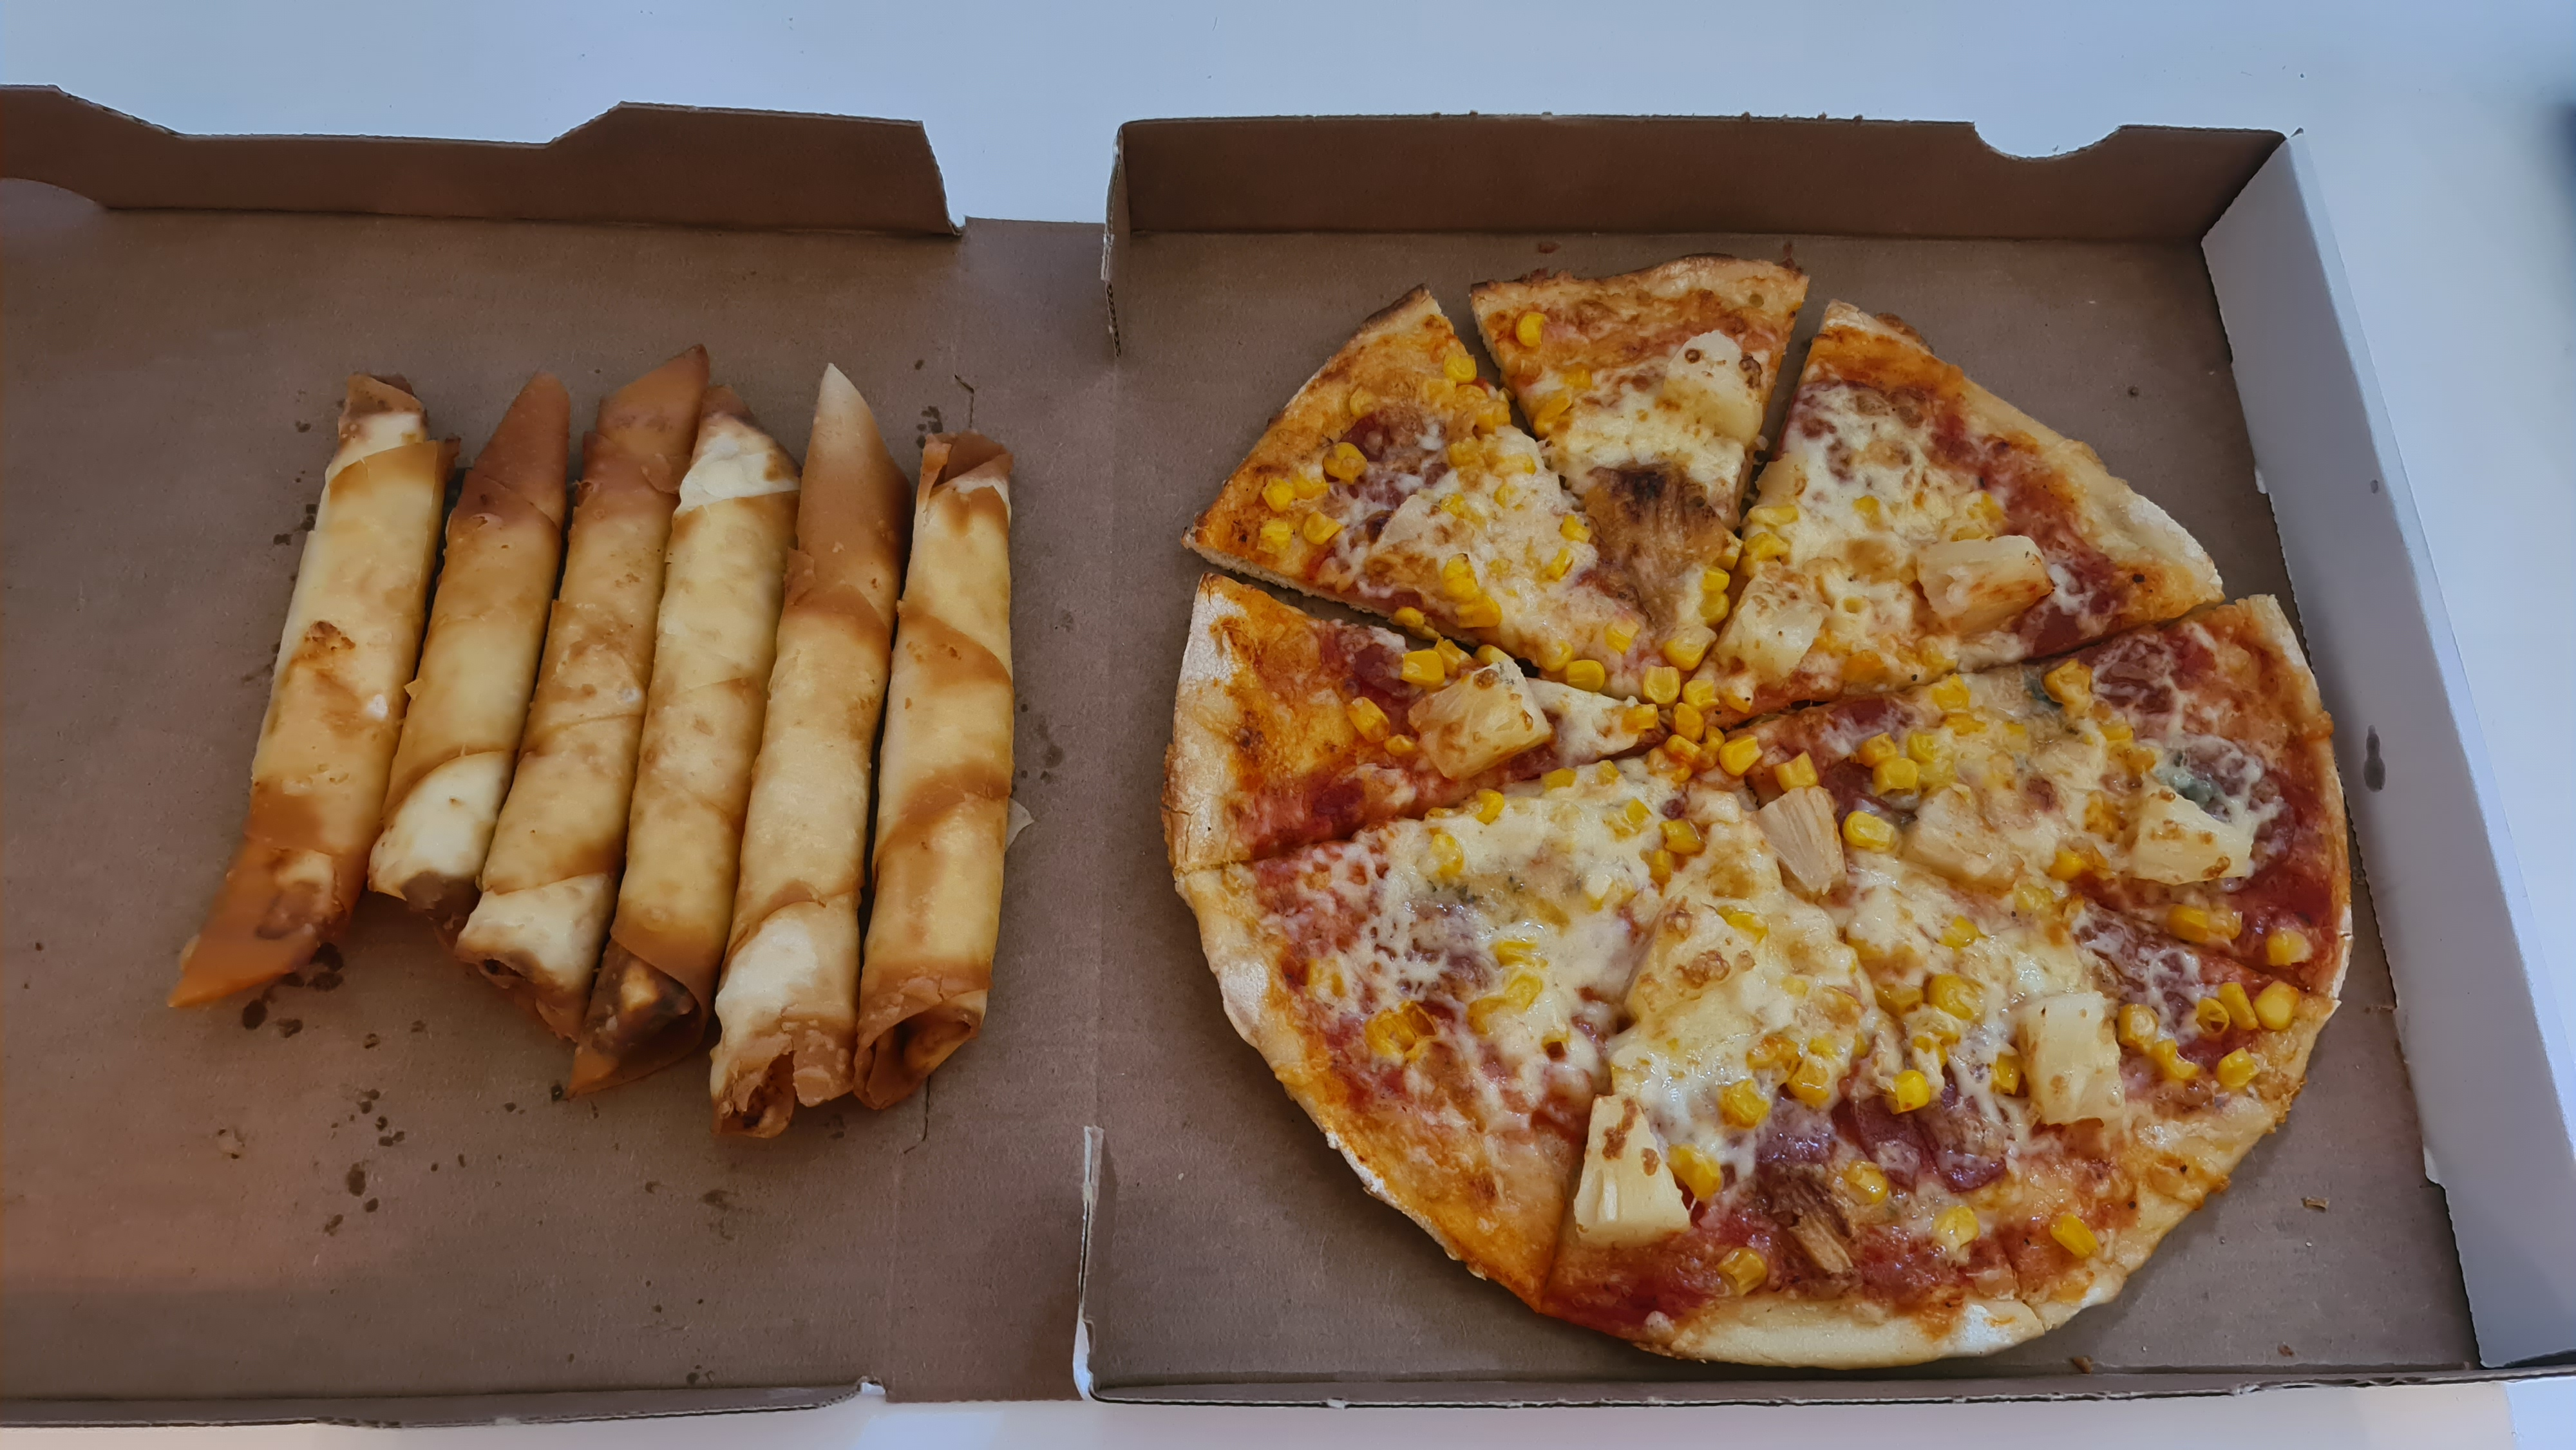 https://foodloader.net/Holz_2020-06-09_Pizza_und_Boerek.jpg